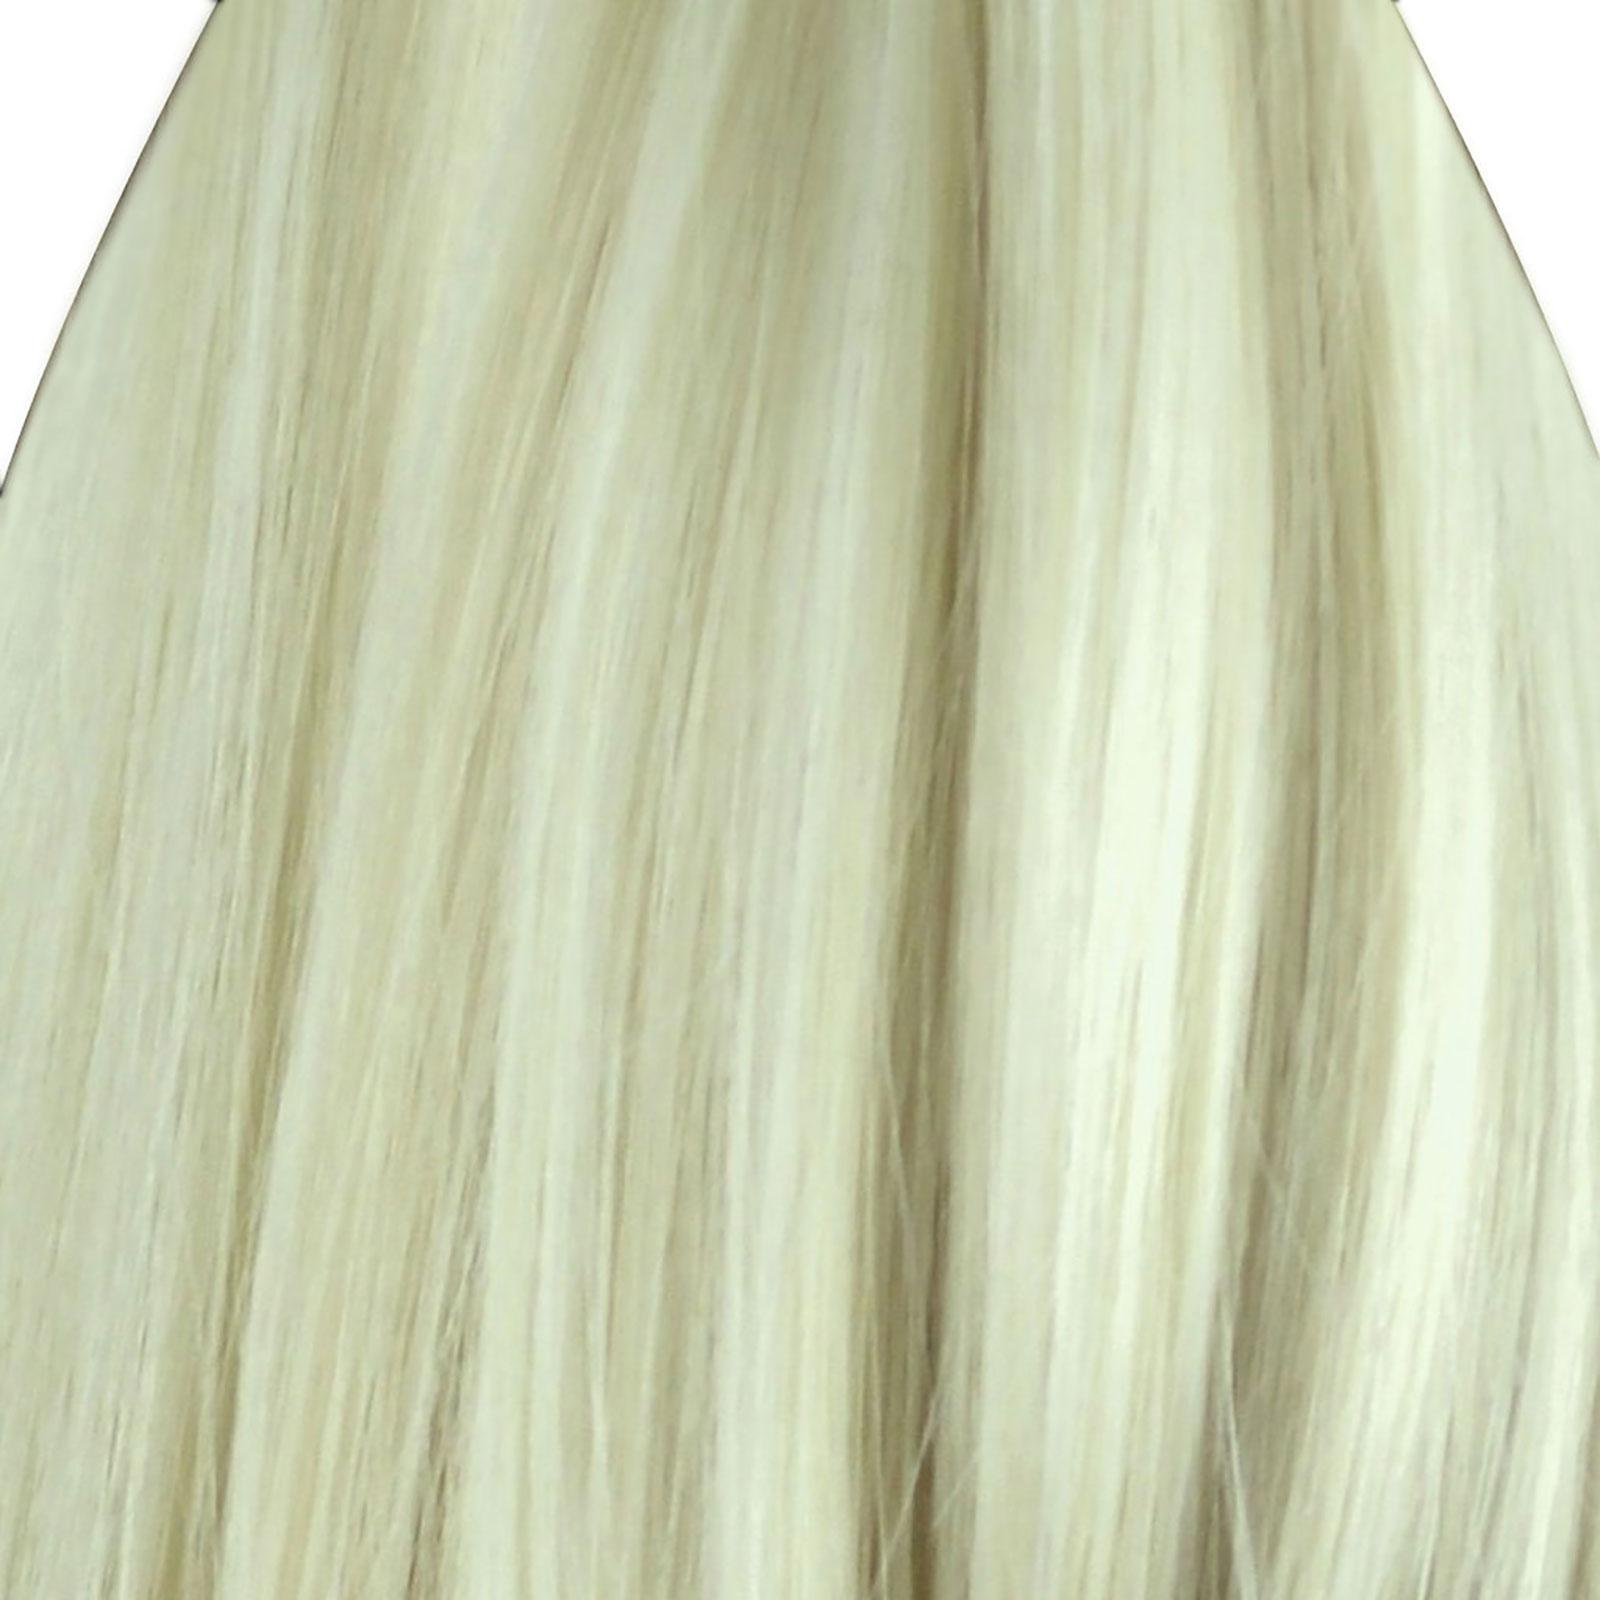 15 Clip In Hair Extensions Straight Light Ash Blonde Full Head 8pcs